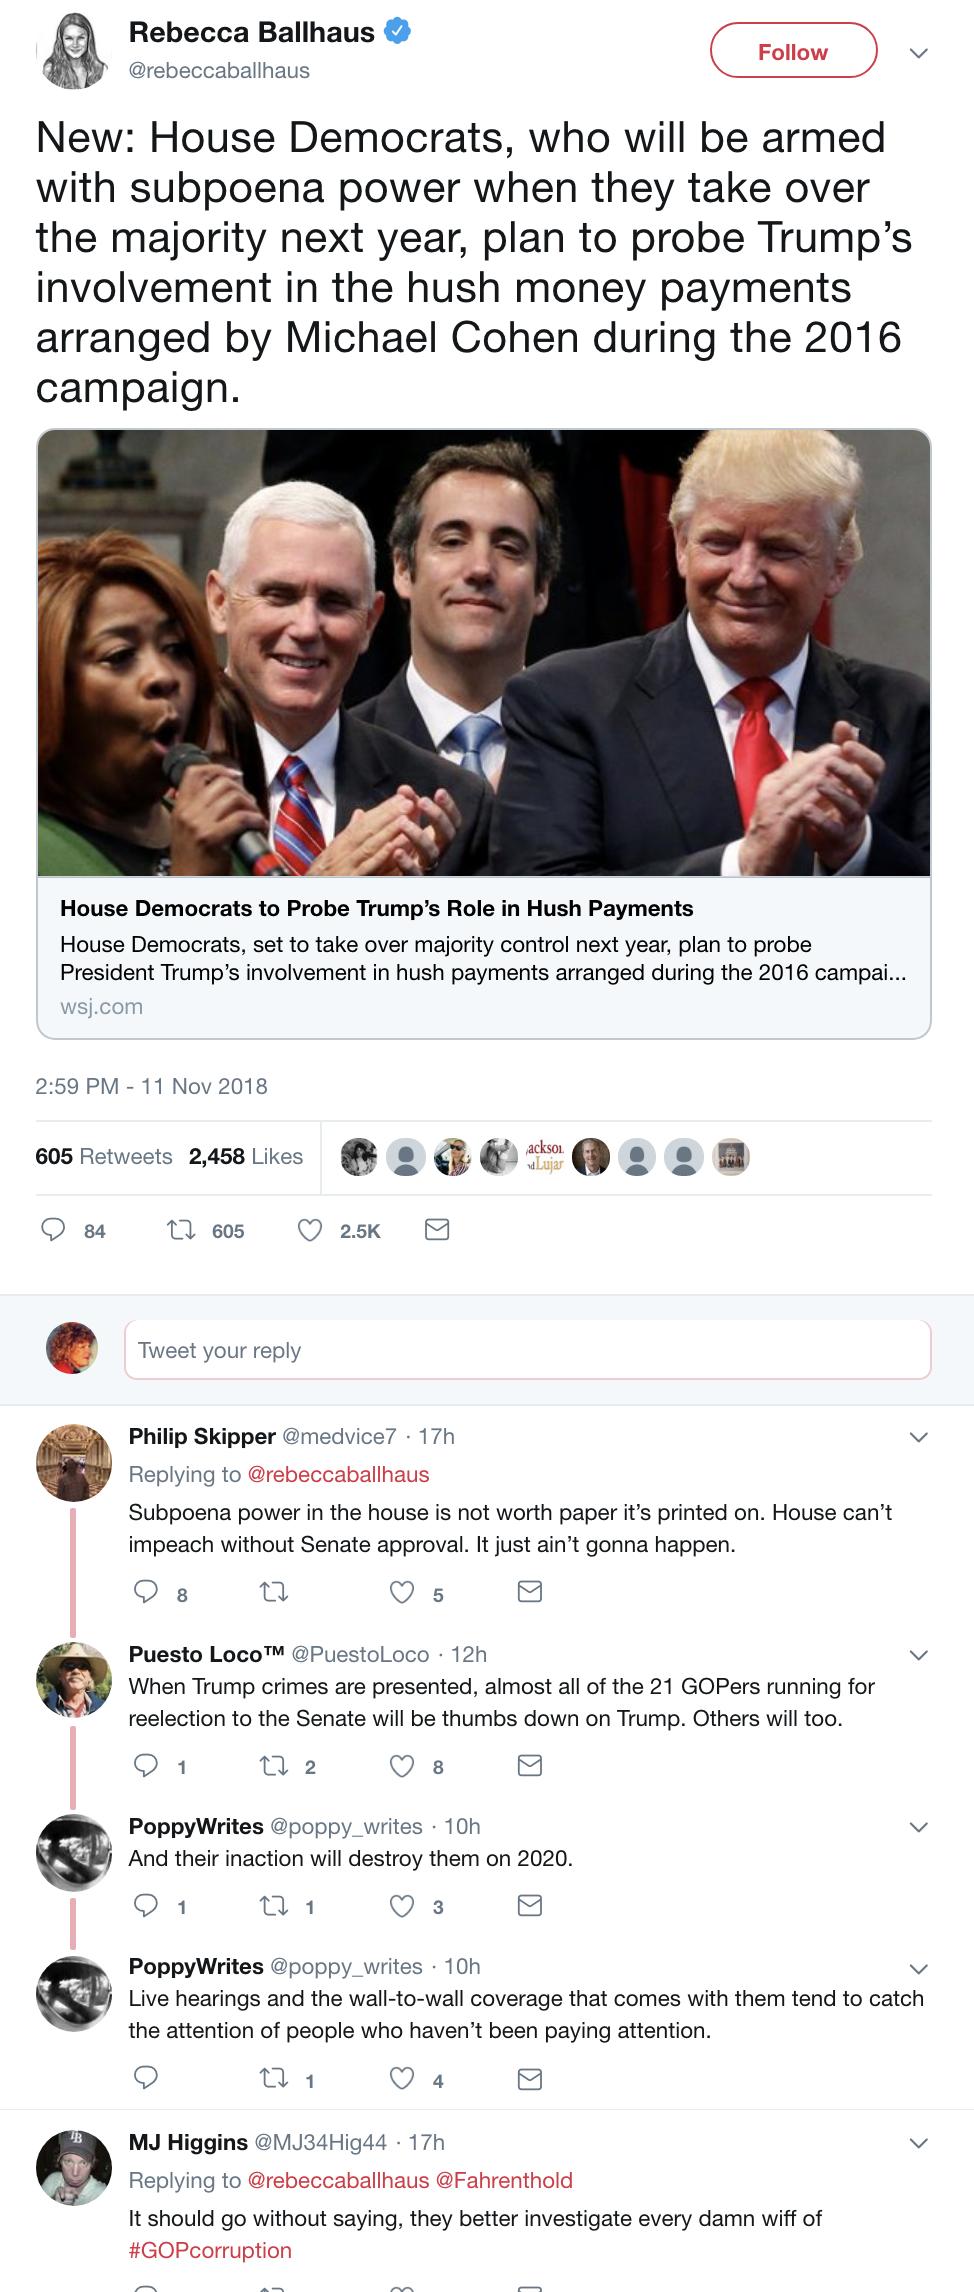 Screen-Shot-2018-11-12-at-8.11.37-AM Democrats Unveil 77 Subpoenas That Have Republicans Shook (DETAILS) Corruption Crime Donald Trump Mueller Russia Top Stories